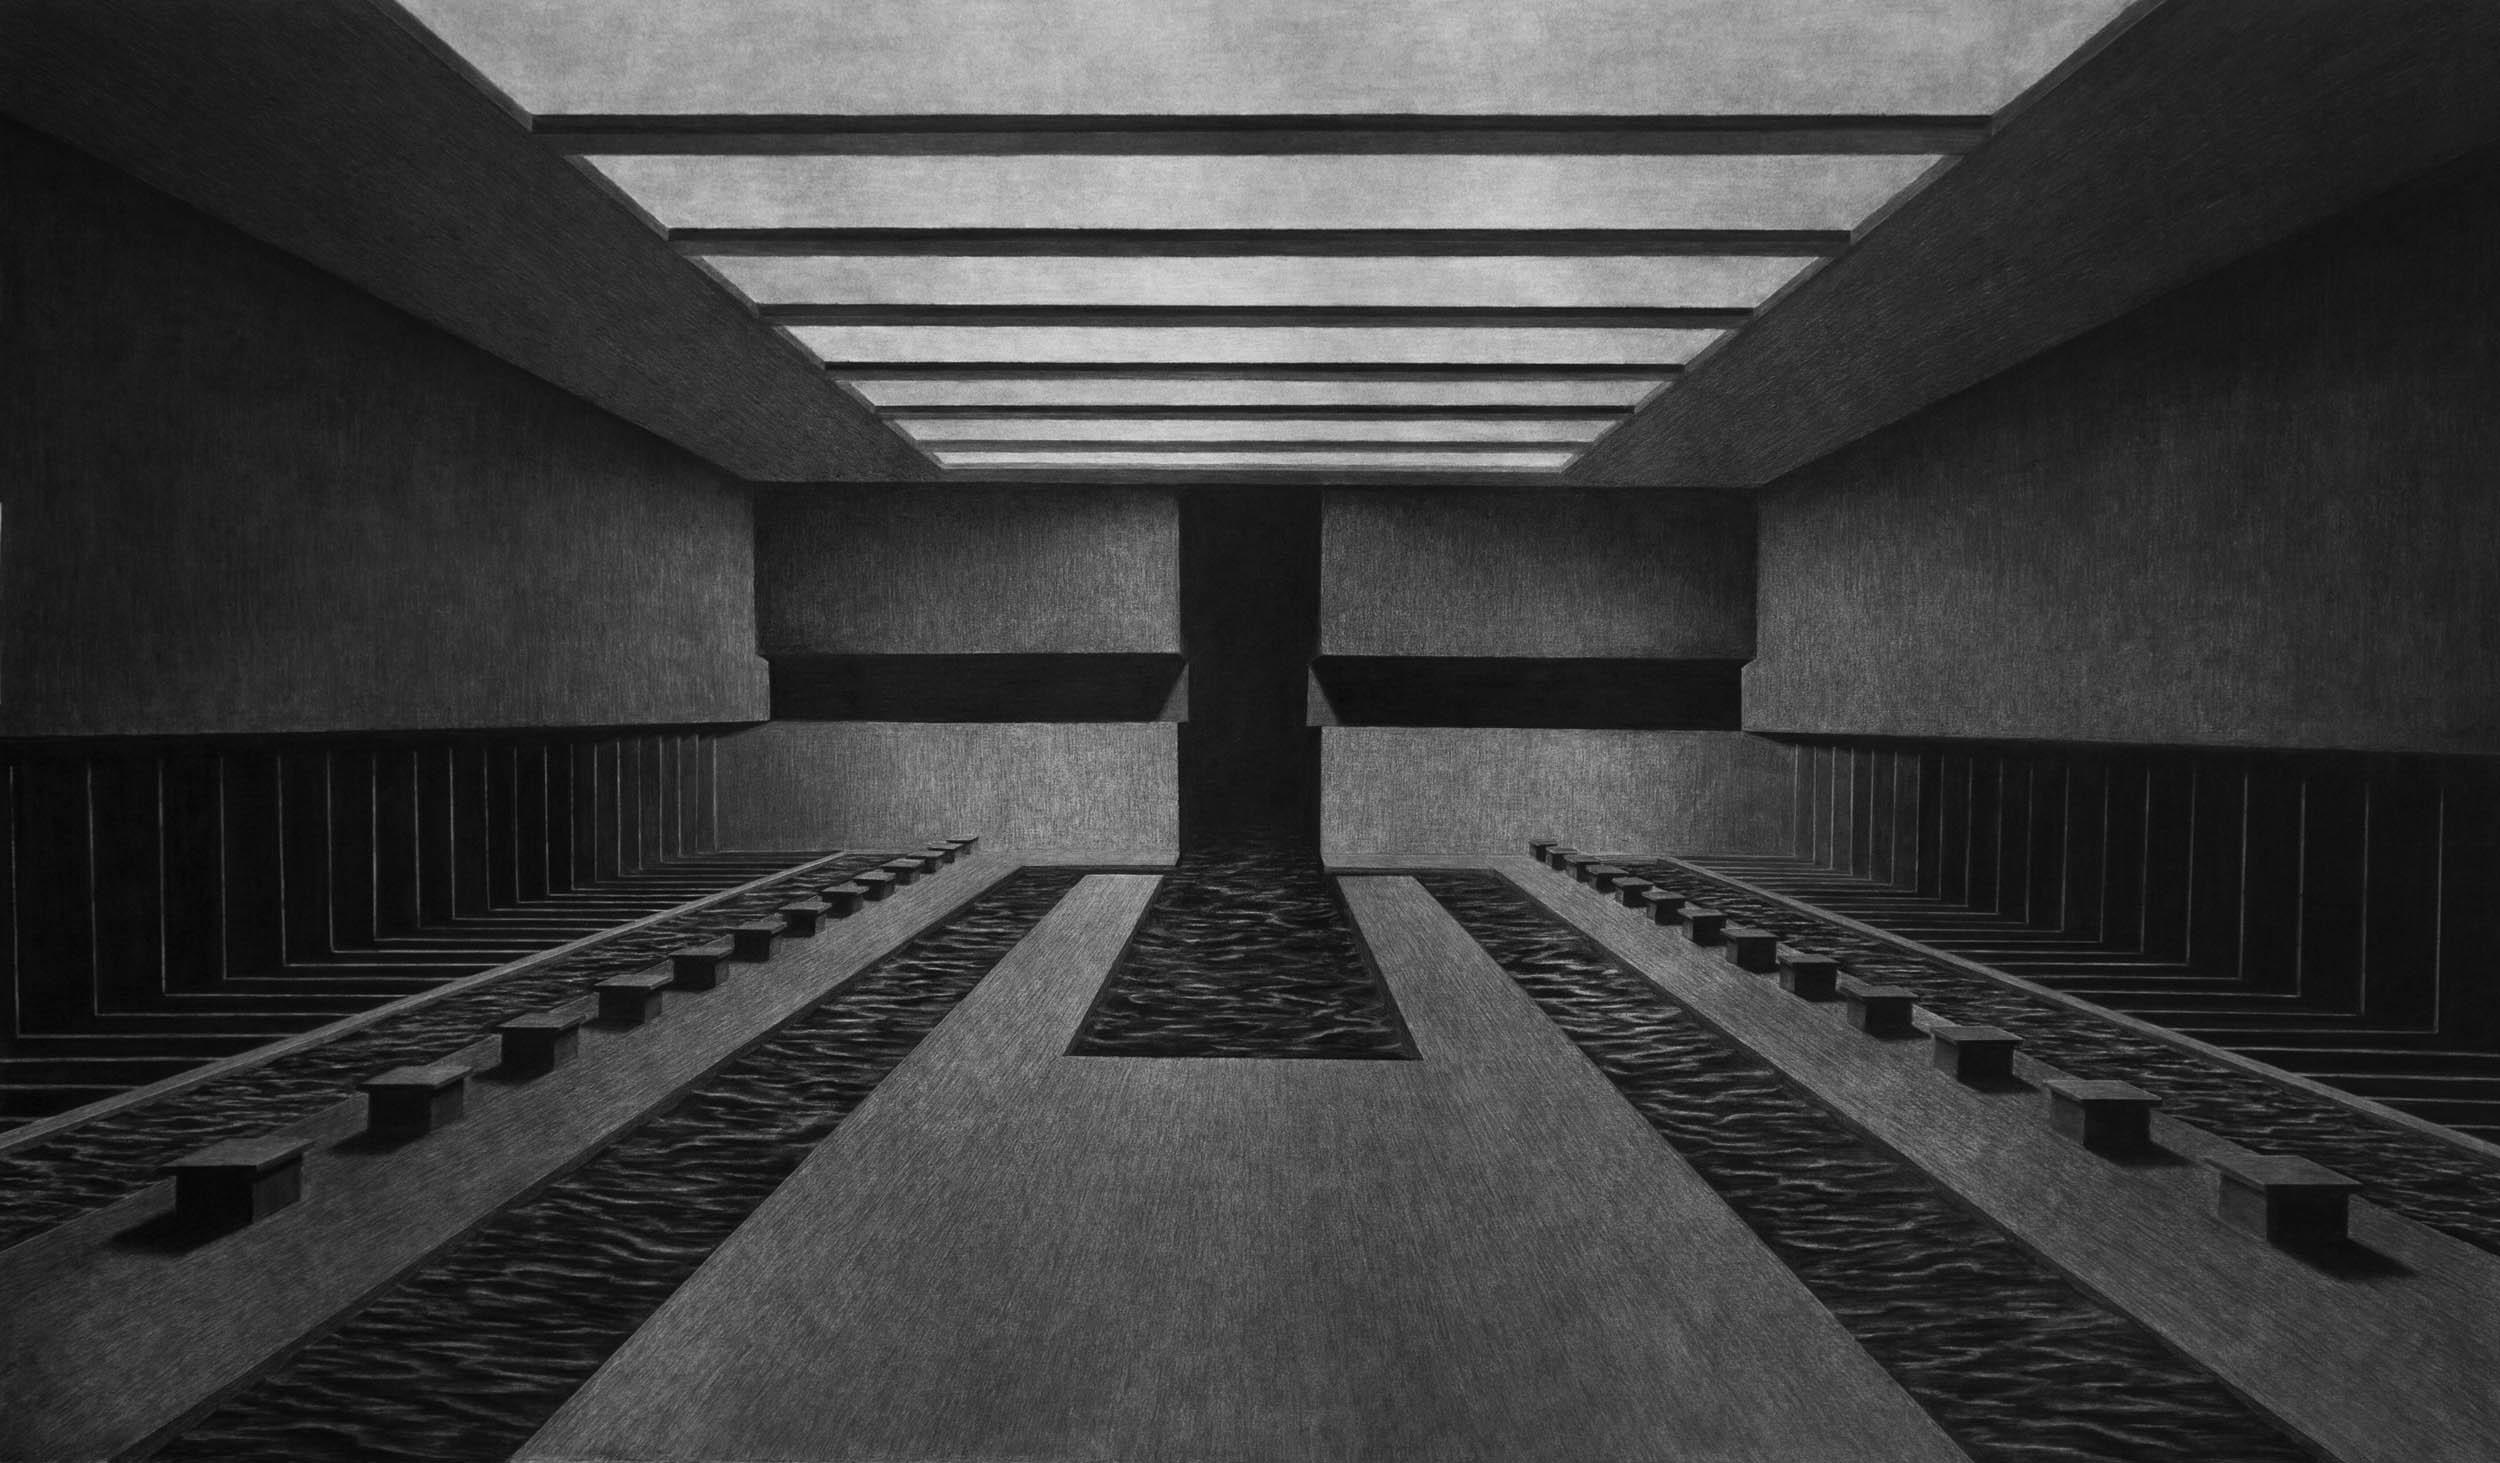 Charcoal drawing, 205 x 120cm, 2017